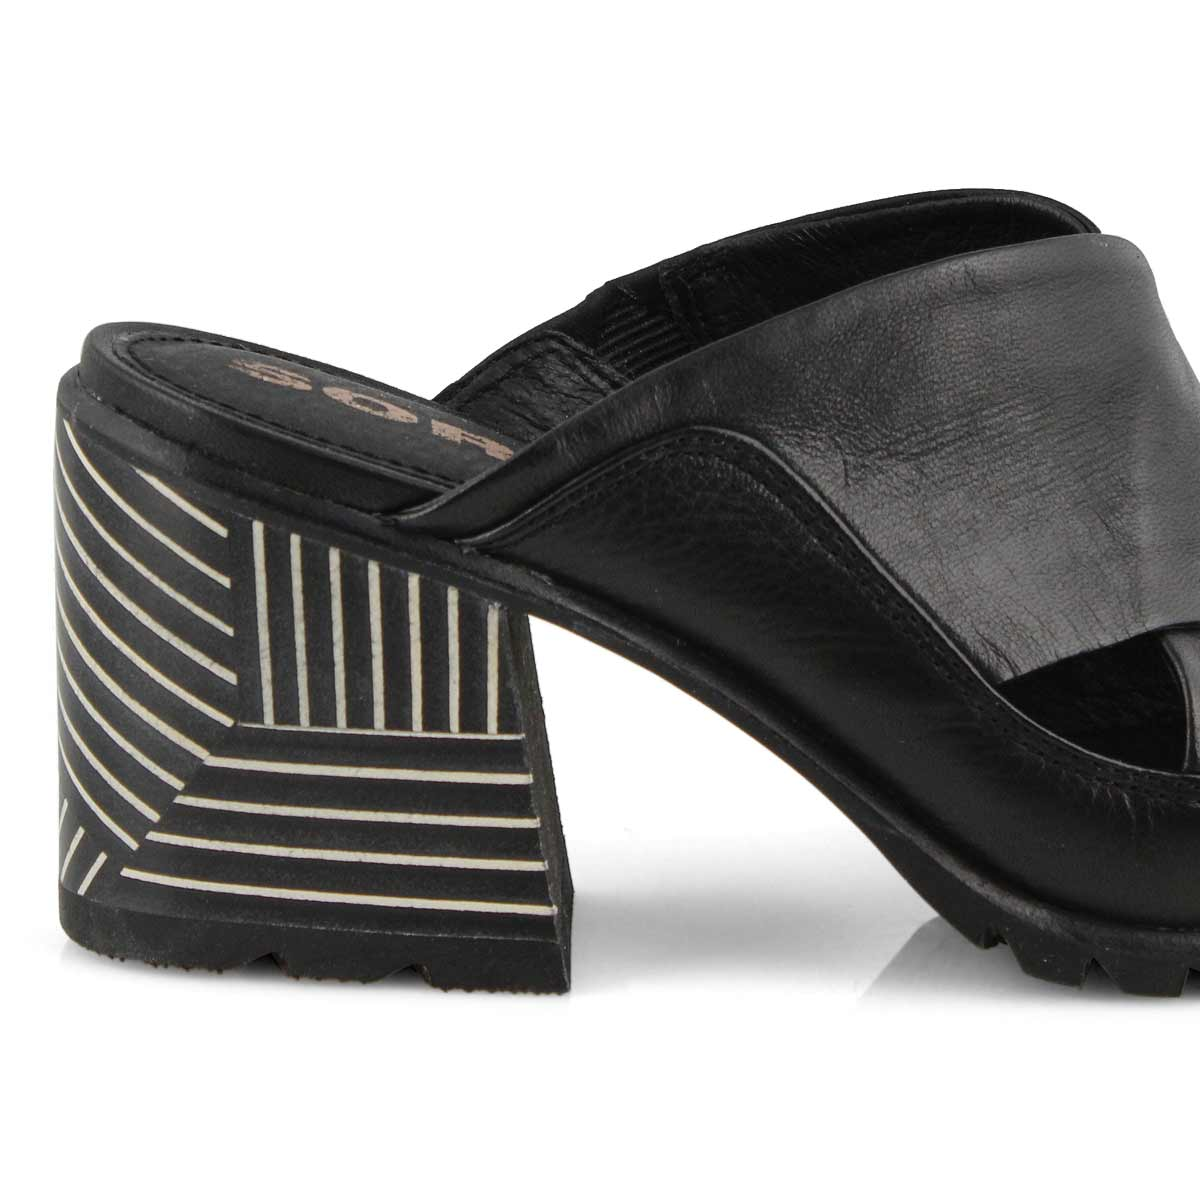 Lds Nadia Mule black dress sandal